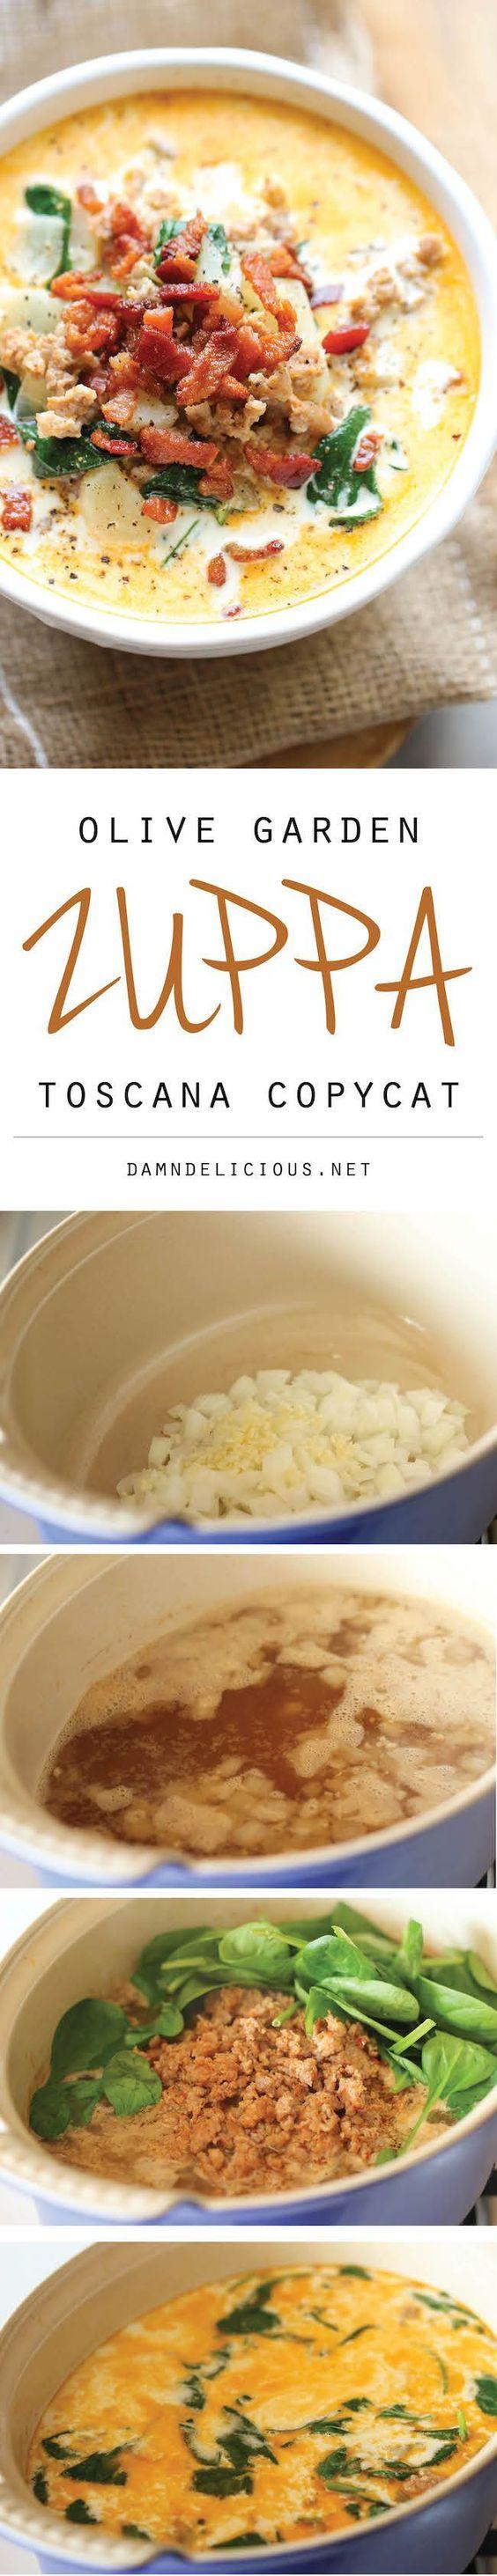 Olive Garden Zuppa Toscana Copycat Recipe Gardens